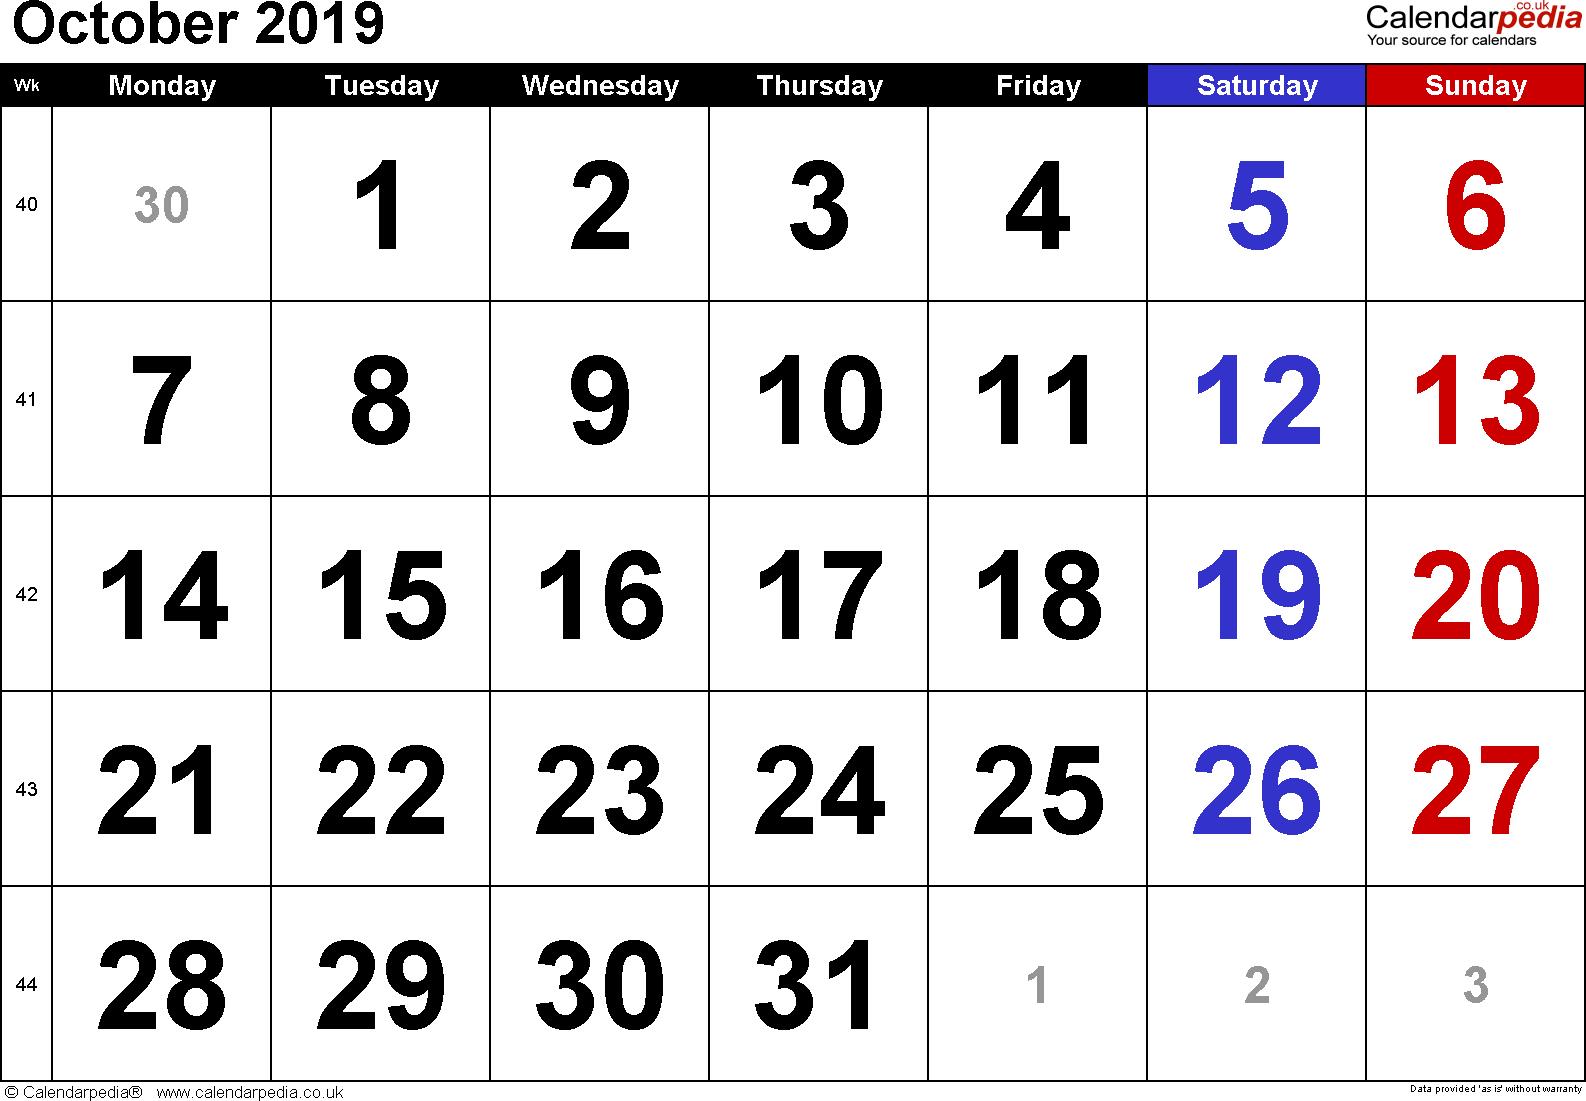 Calendar October 2019 Uk, Bank Holidays, Excel/pdf/word Templates throughout Calendar October 2019 Pocket Calendar